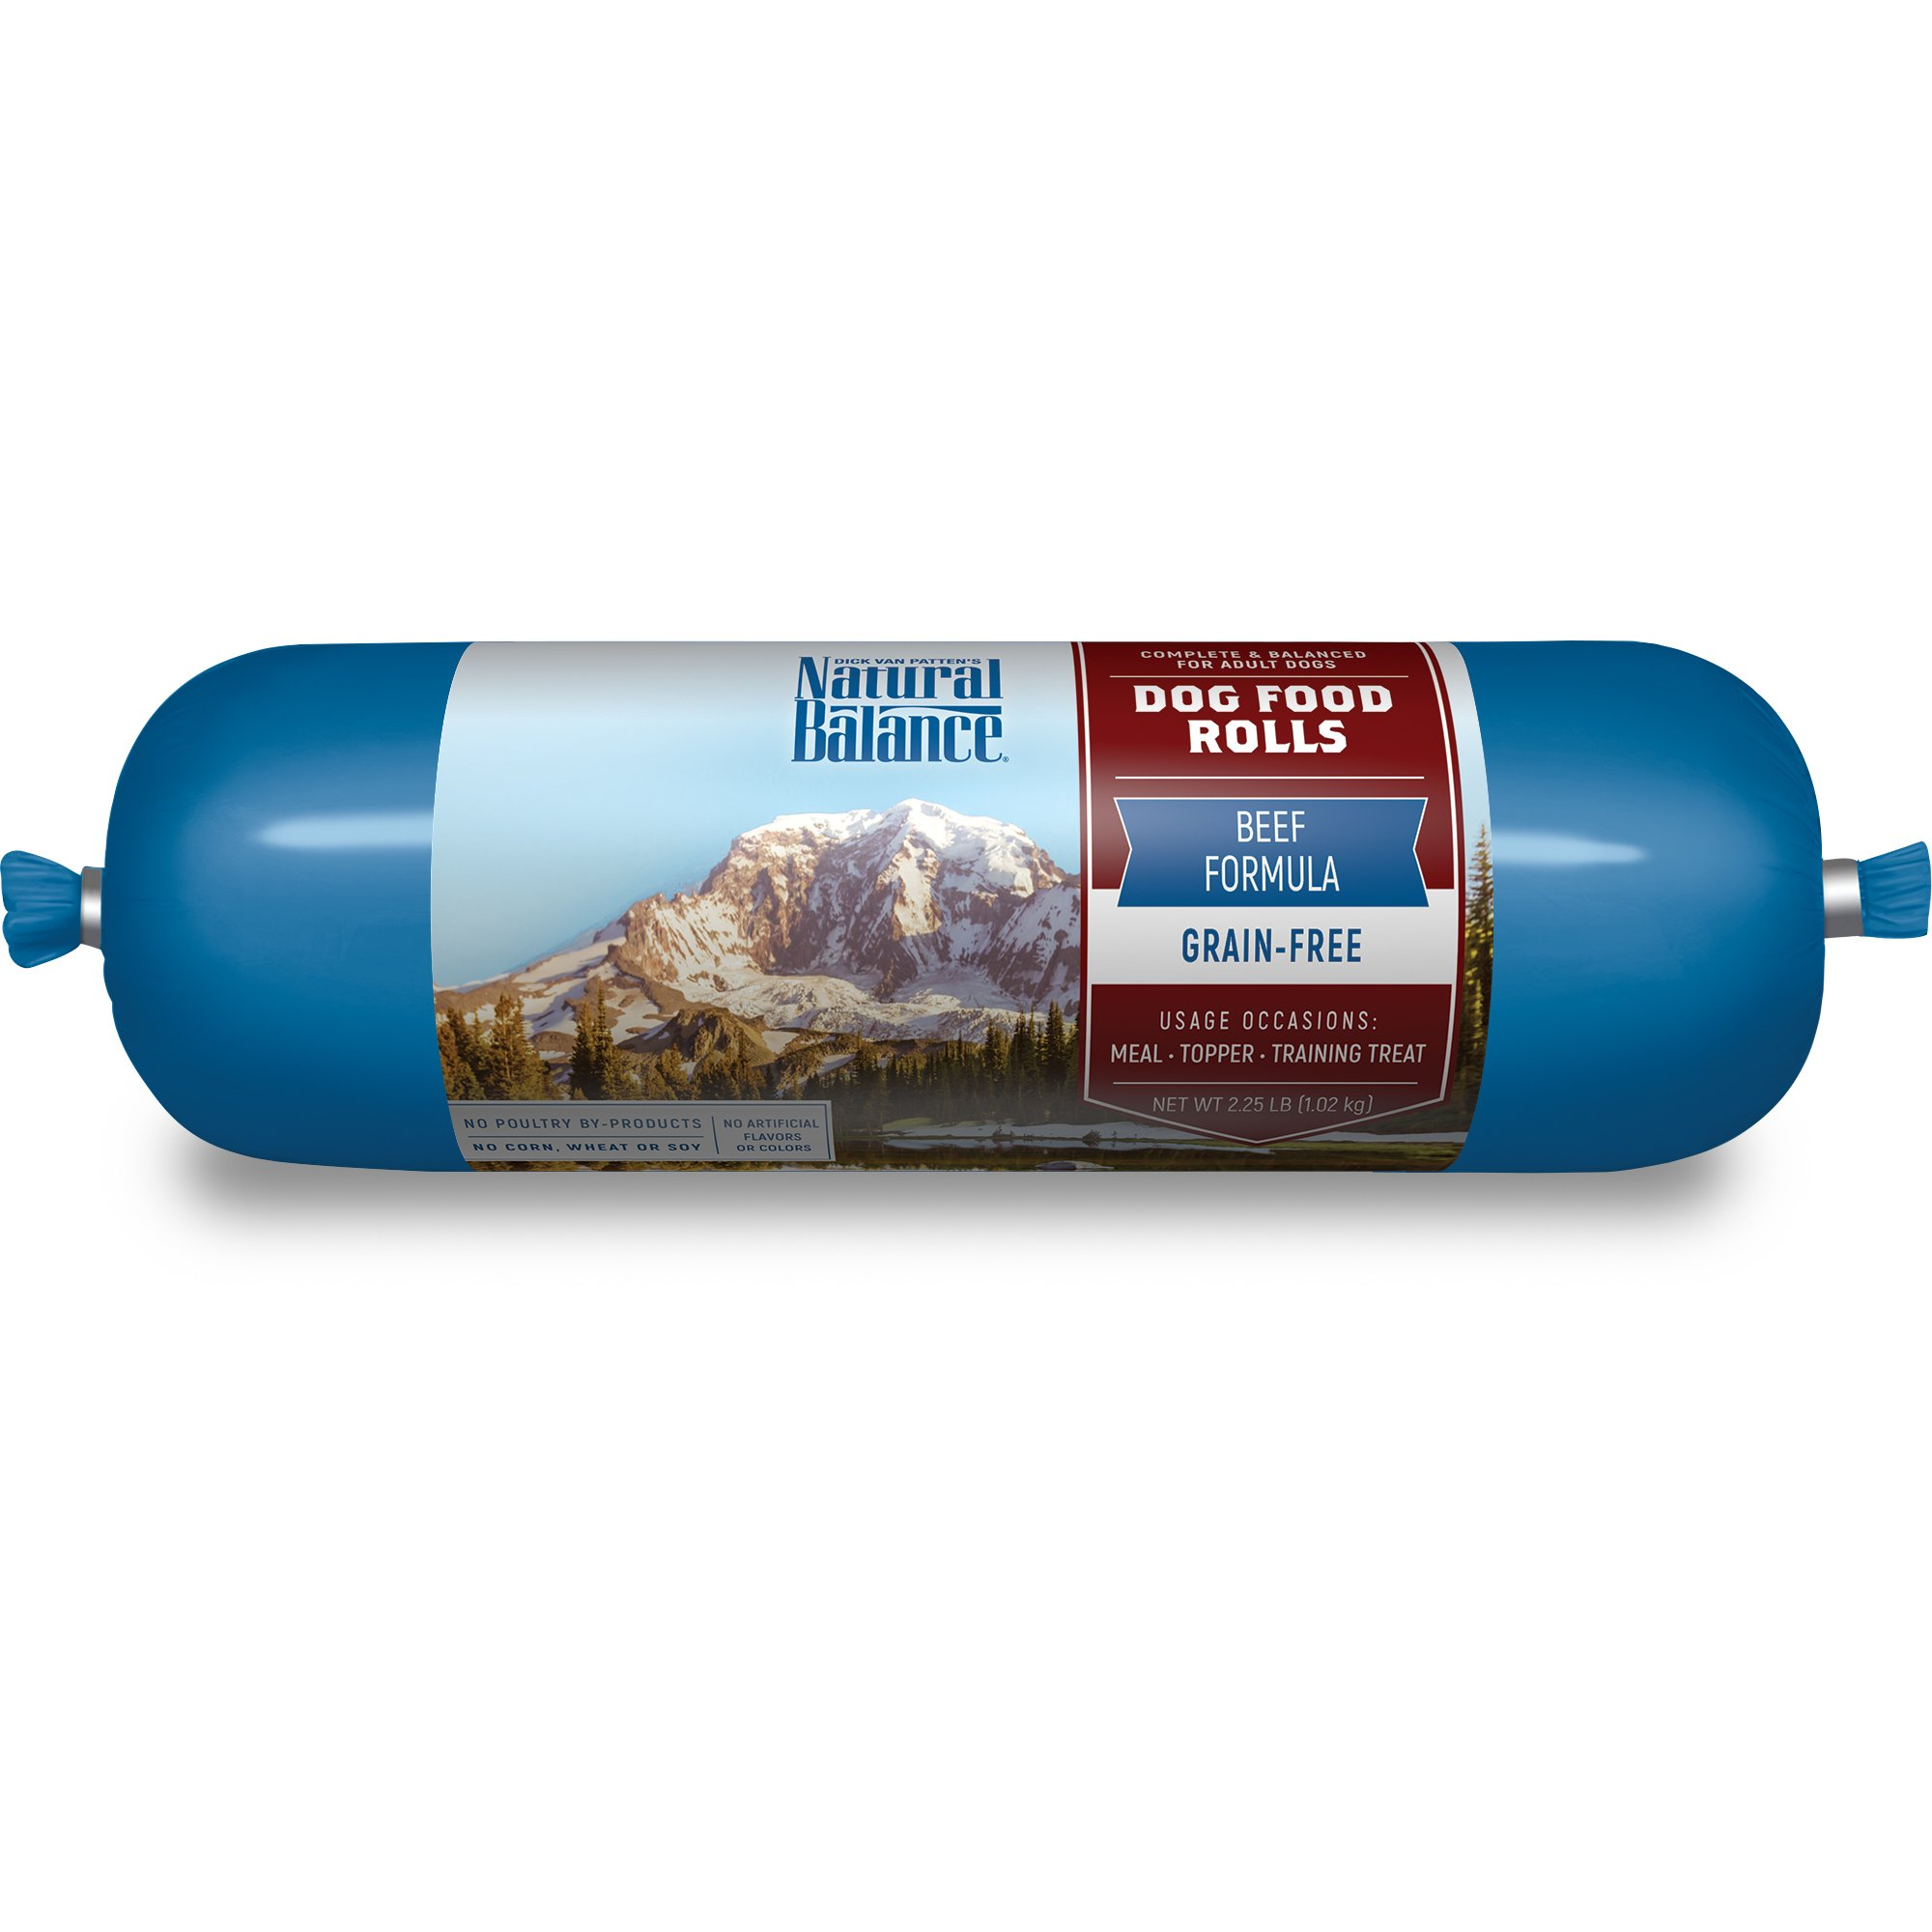 Natural Balance Beef Formula Dog Food Rolls